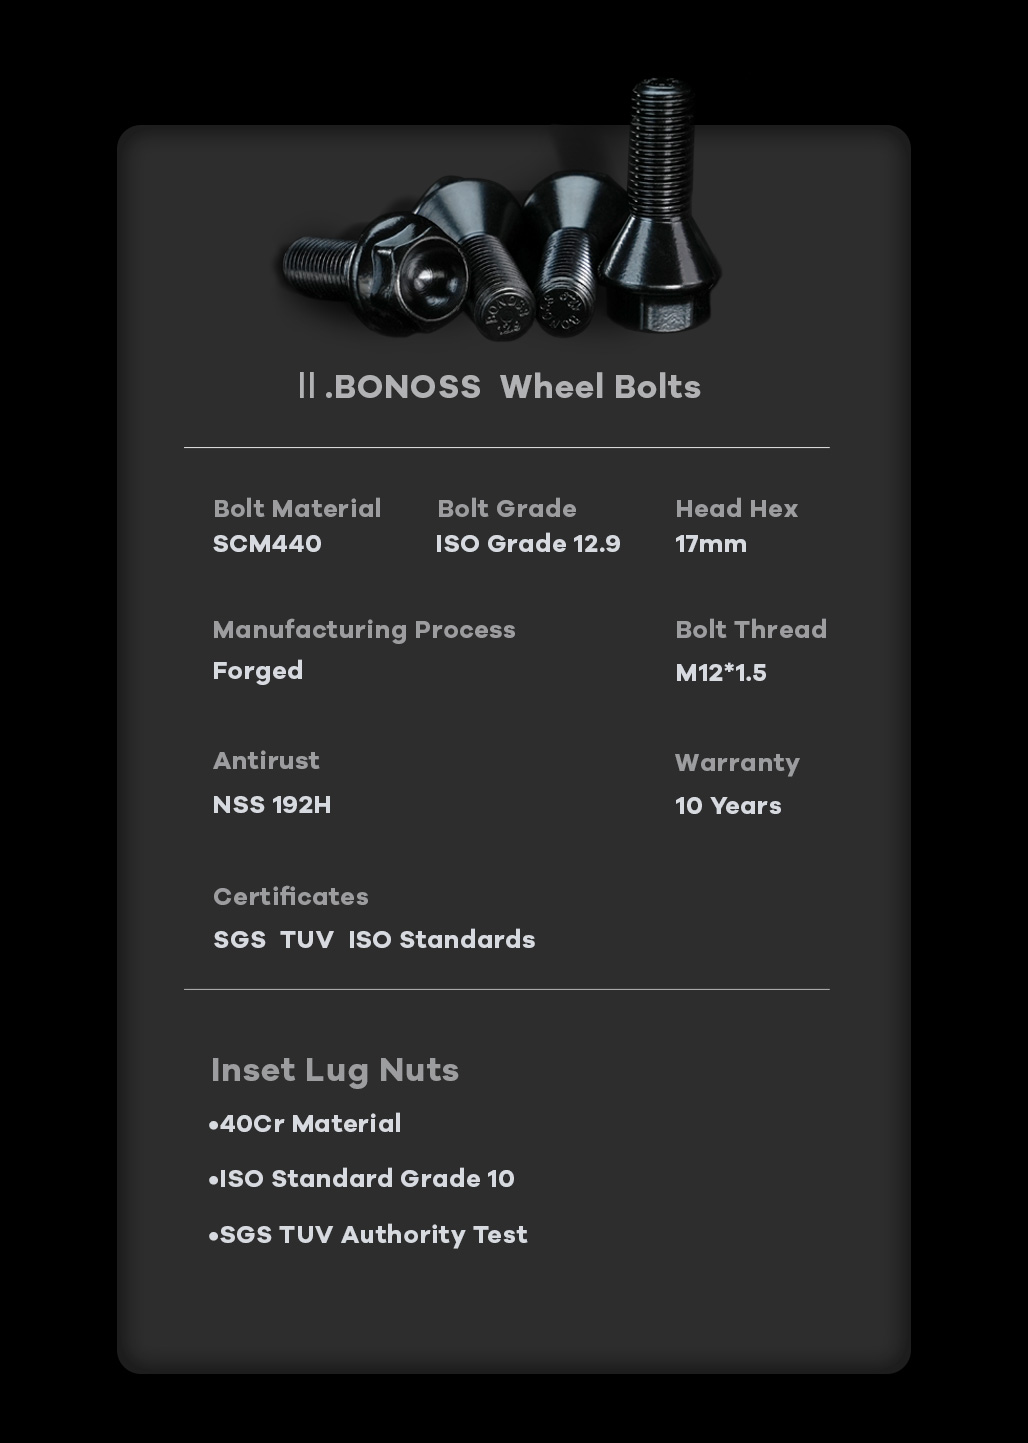 BONOSS-forged-active-cooling-4-Lug-wheel-spacers-(custom-wheel-spacers)-M12x1.5-by-lulu-10